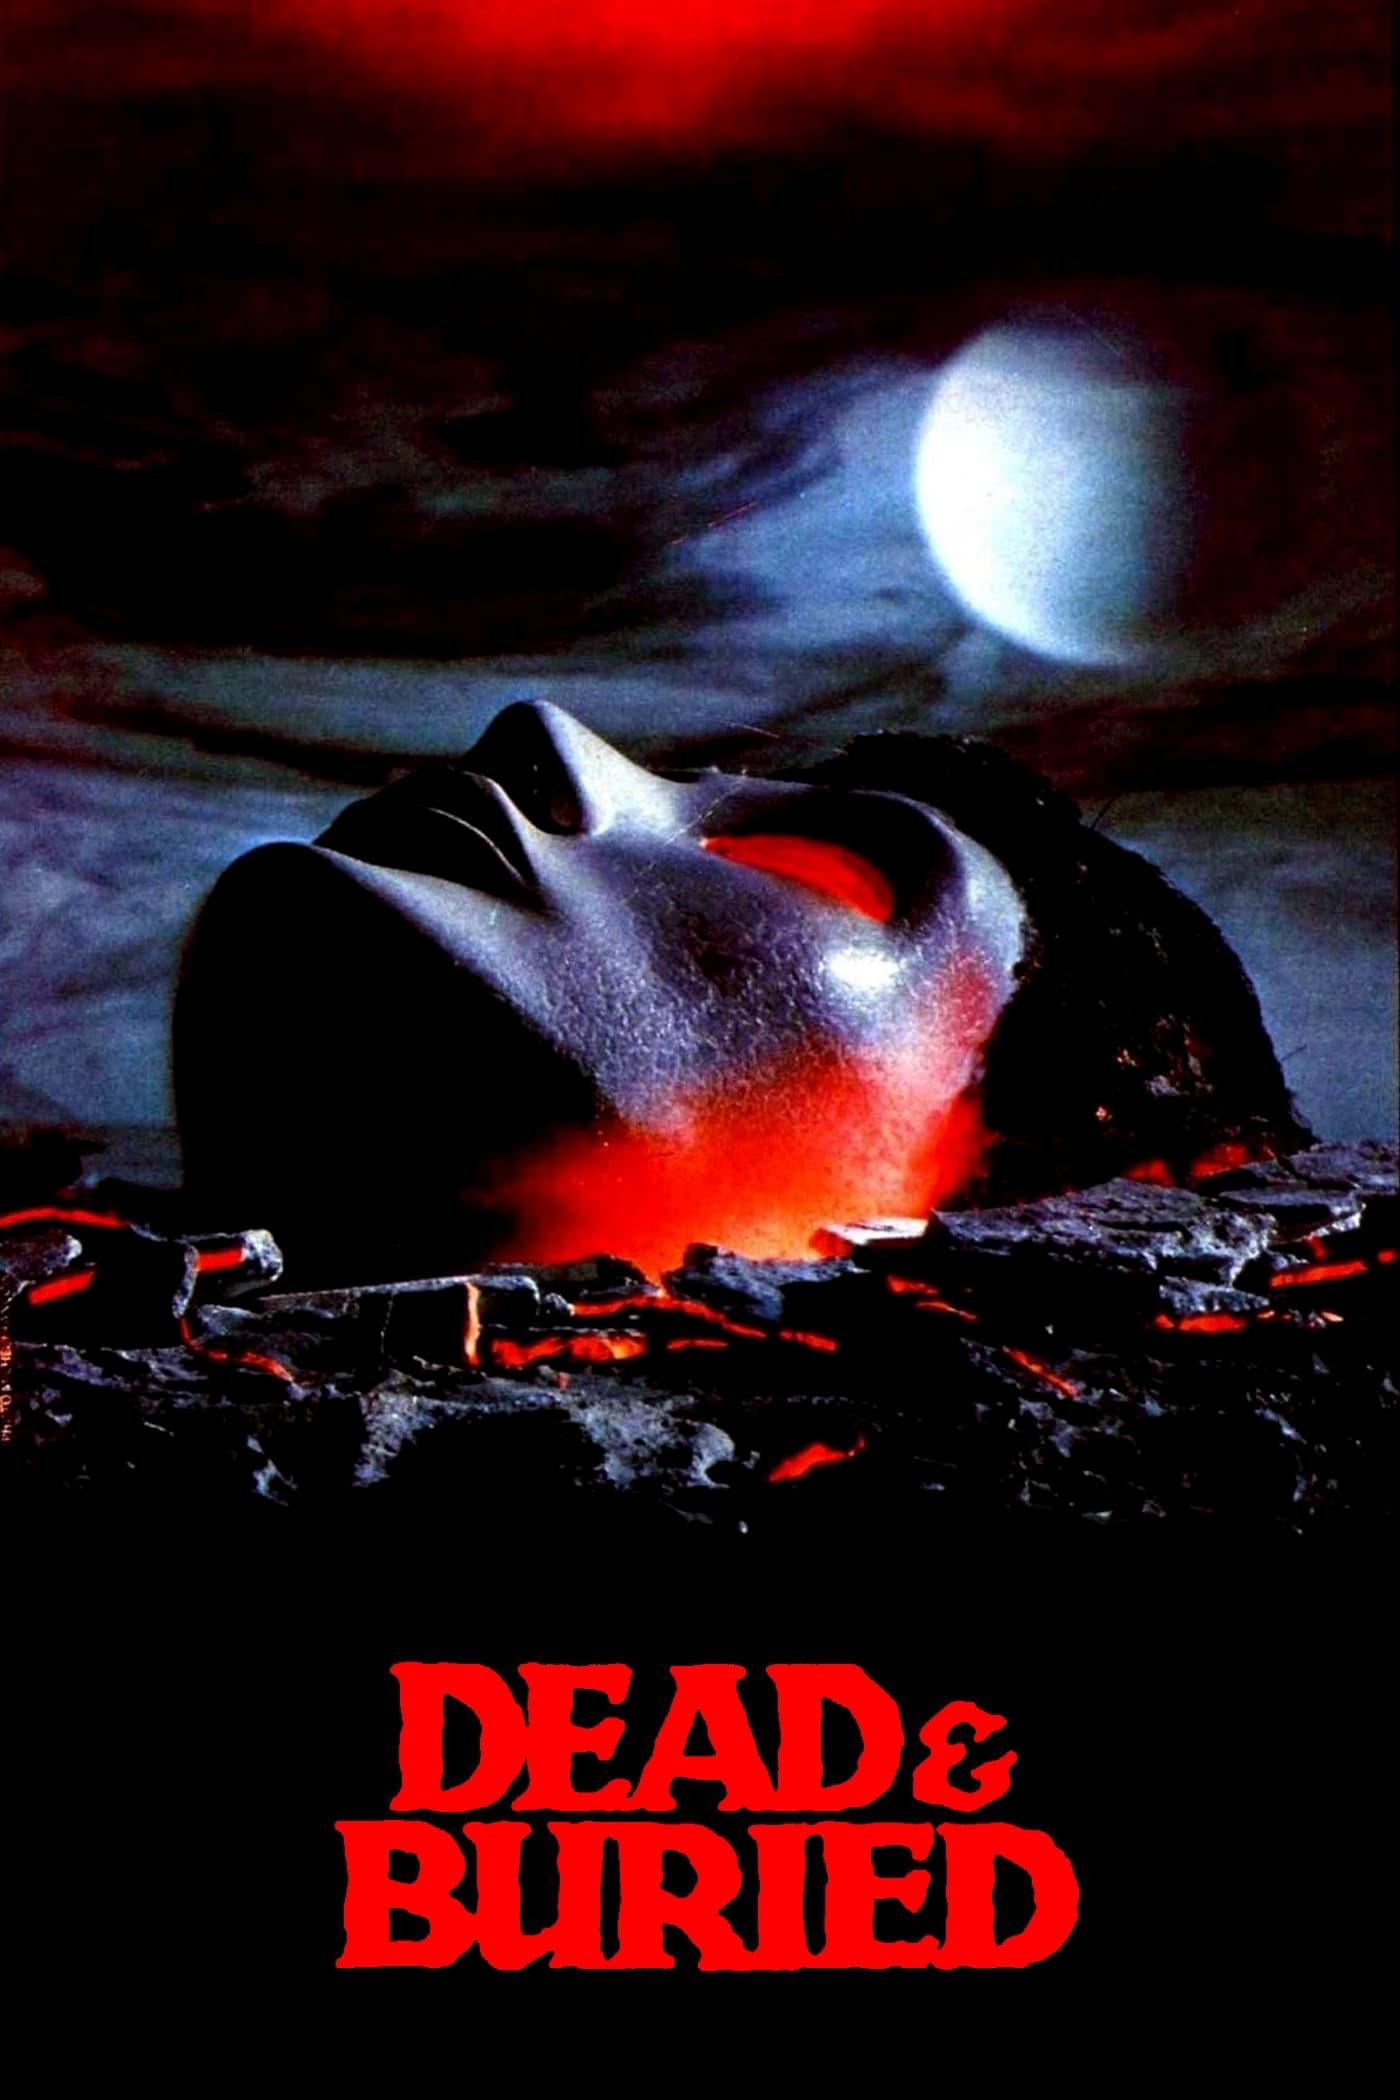 Os Mortos Vivos